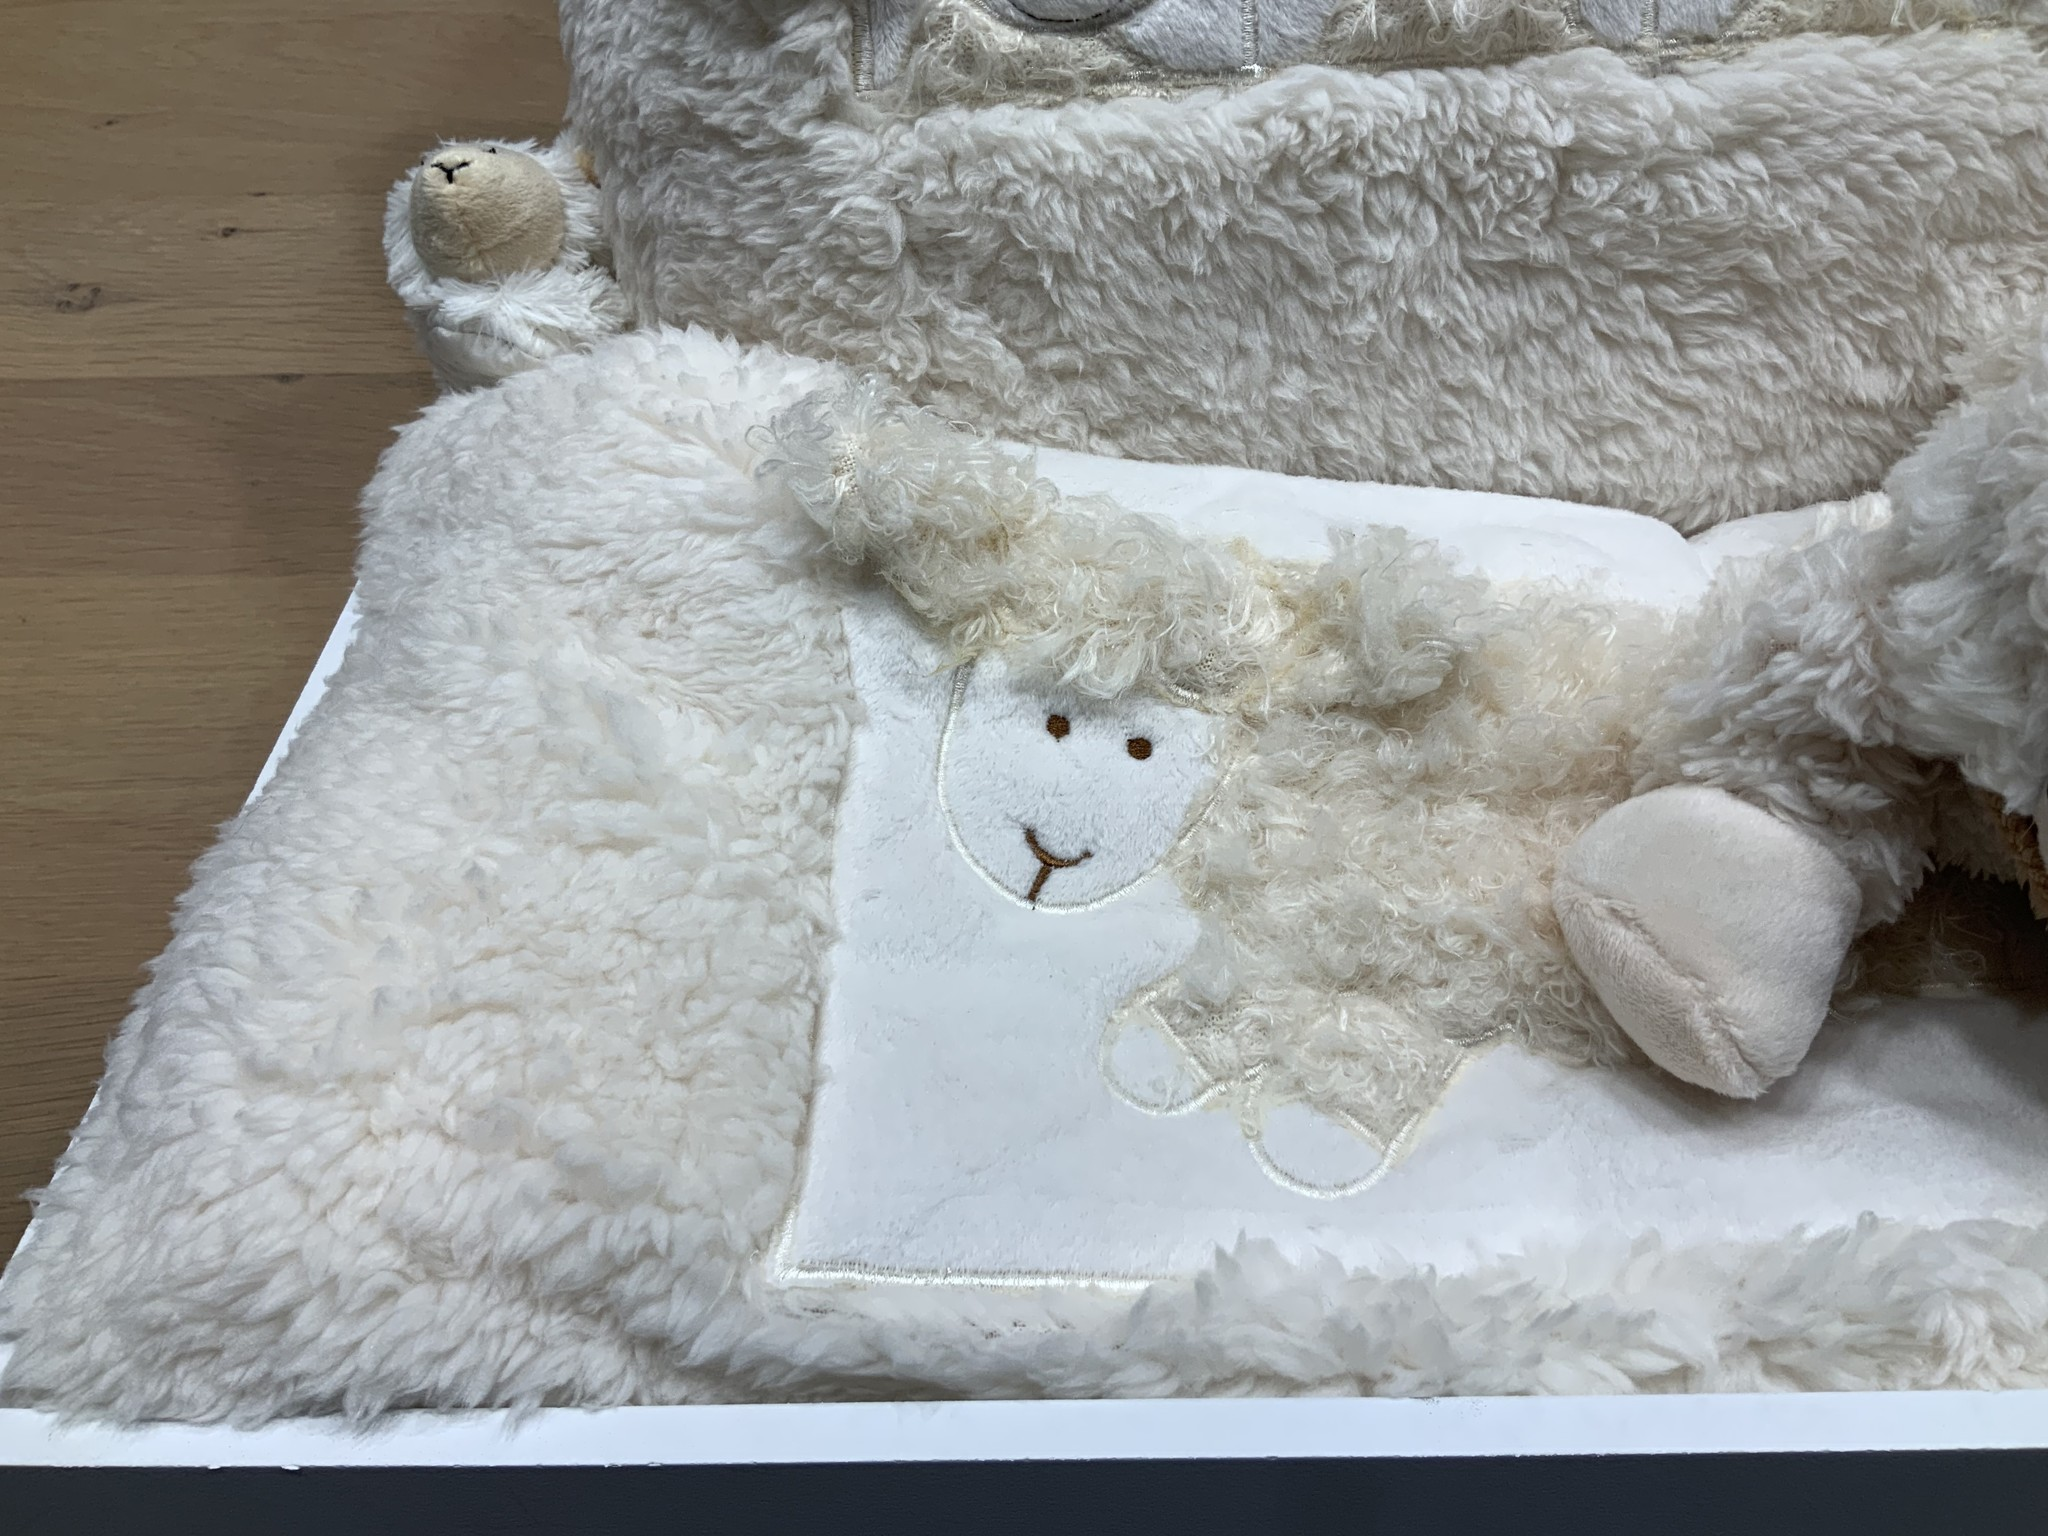 Mars & More SOFT SHEEP